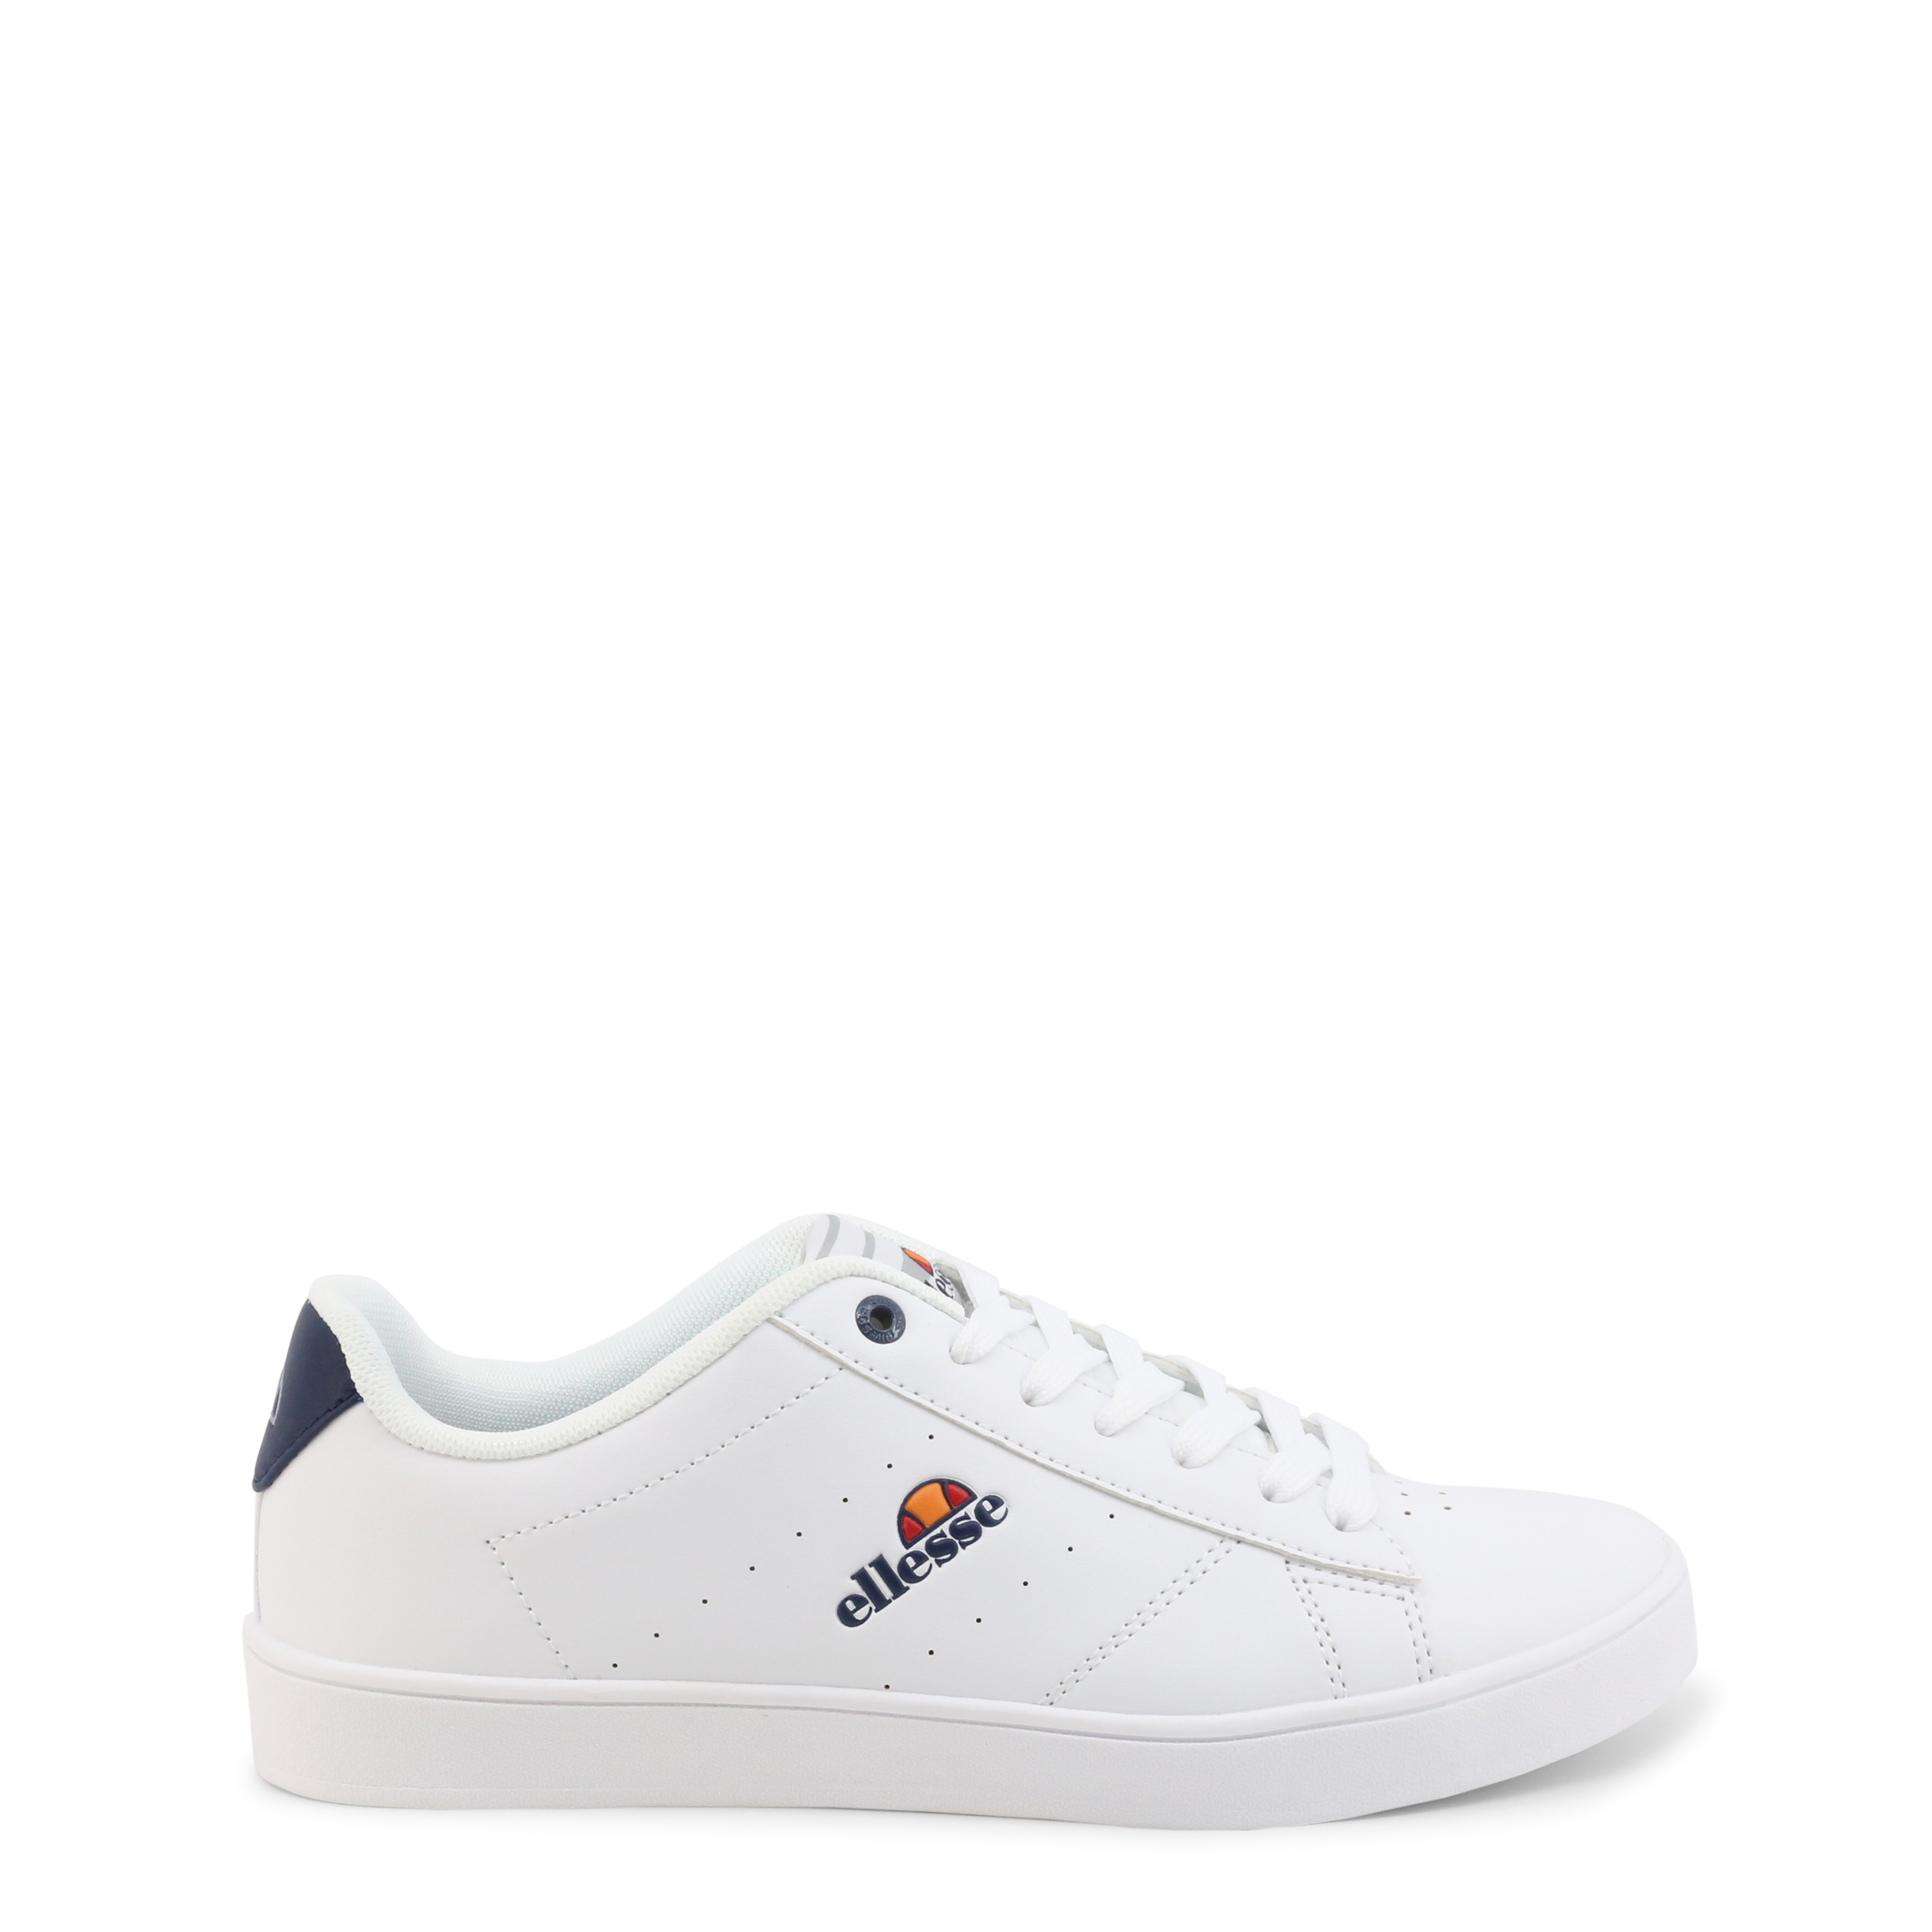 Ellesse - EL11W80450 - White